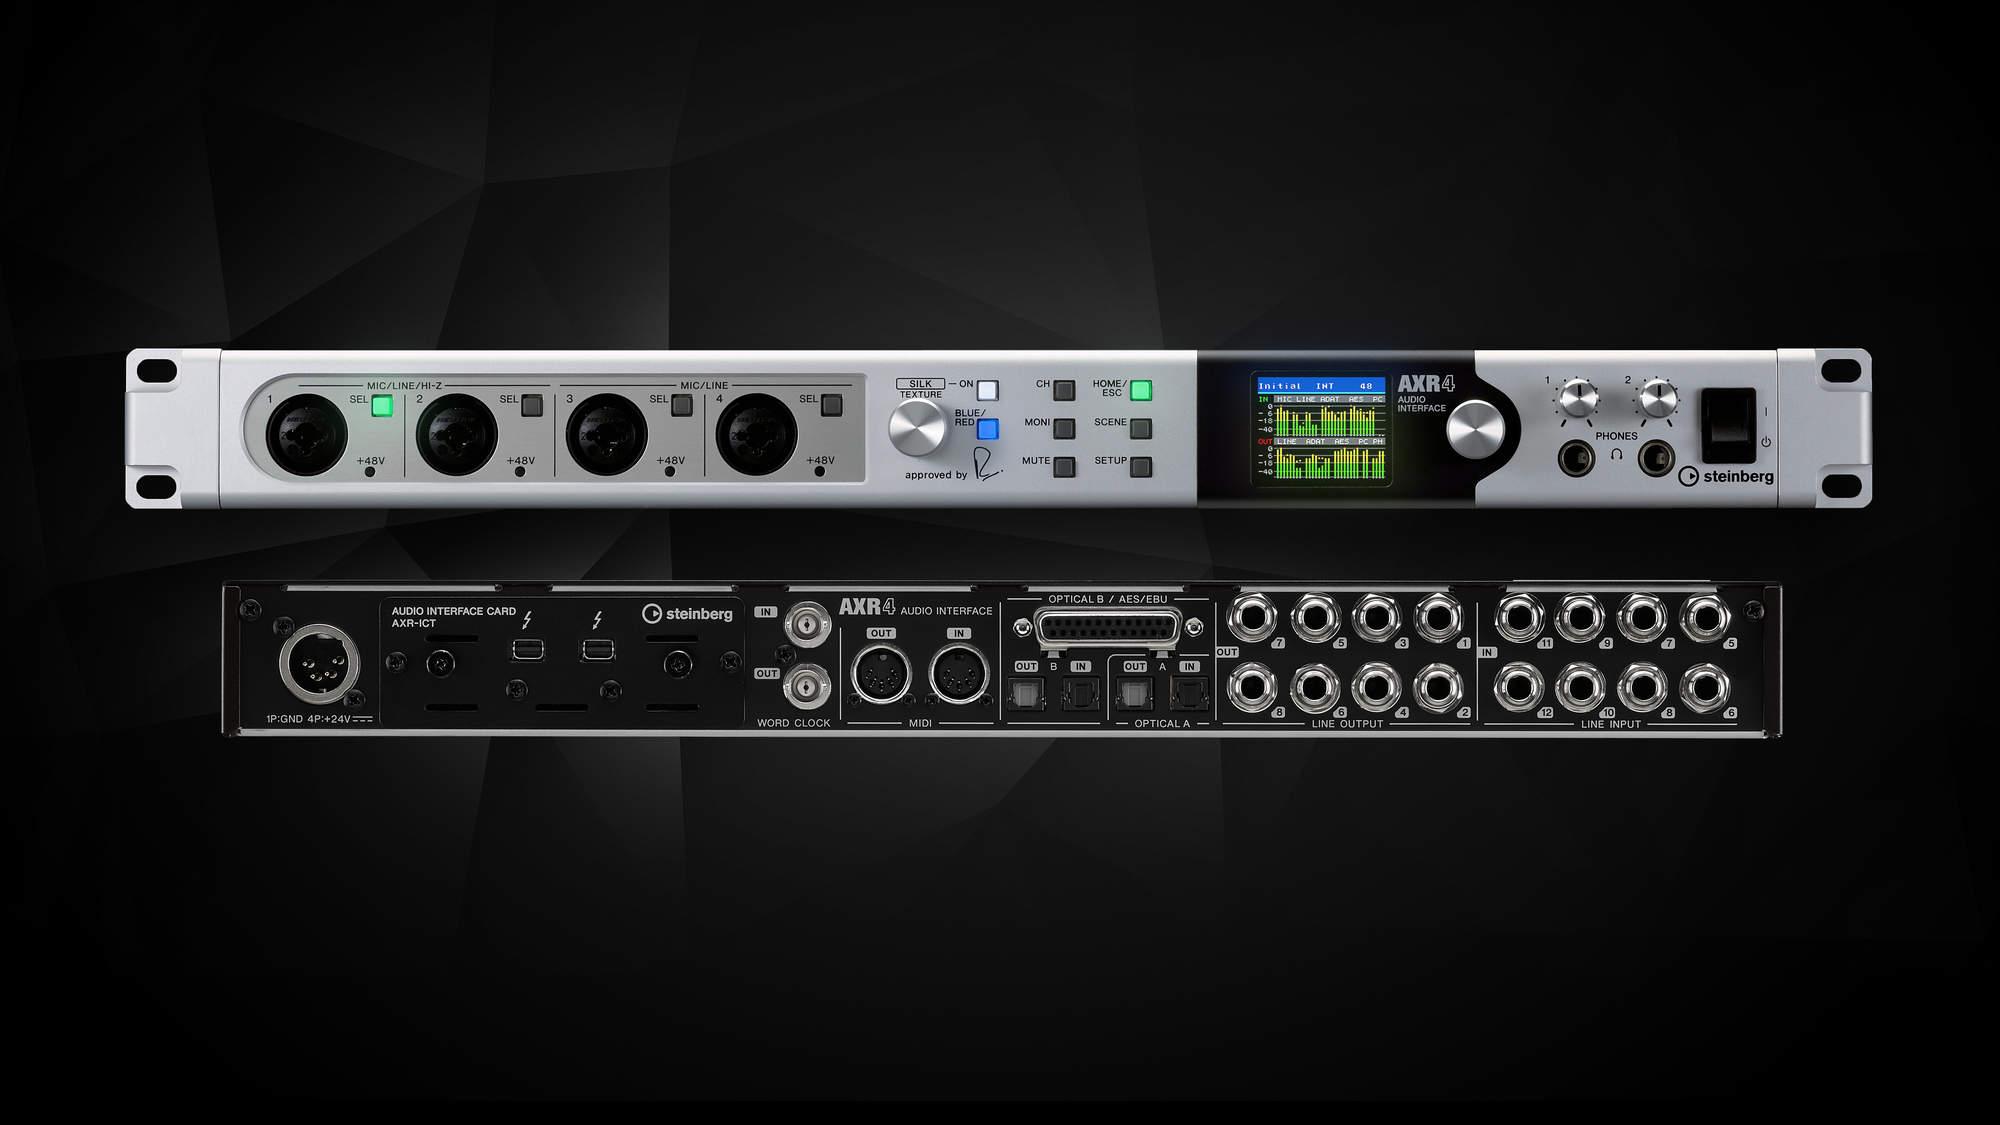 NAMM 2019: Steinberg AXR4 Thunderbolt Audio-Interface